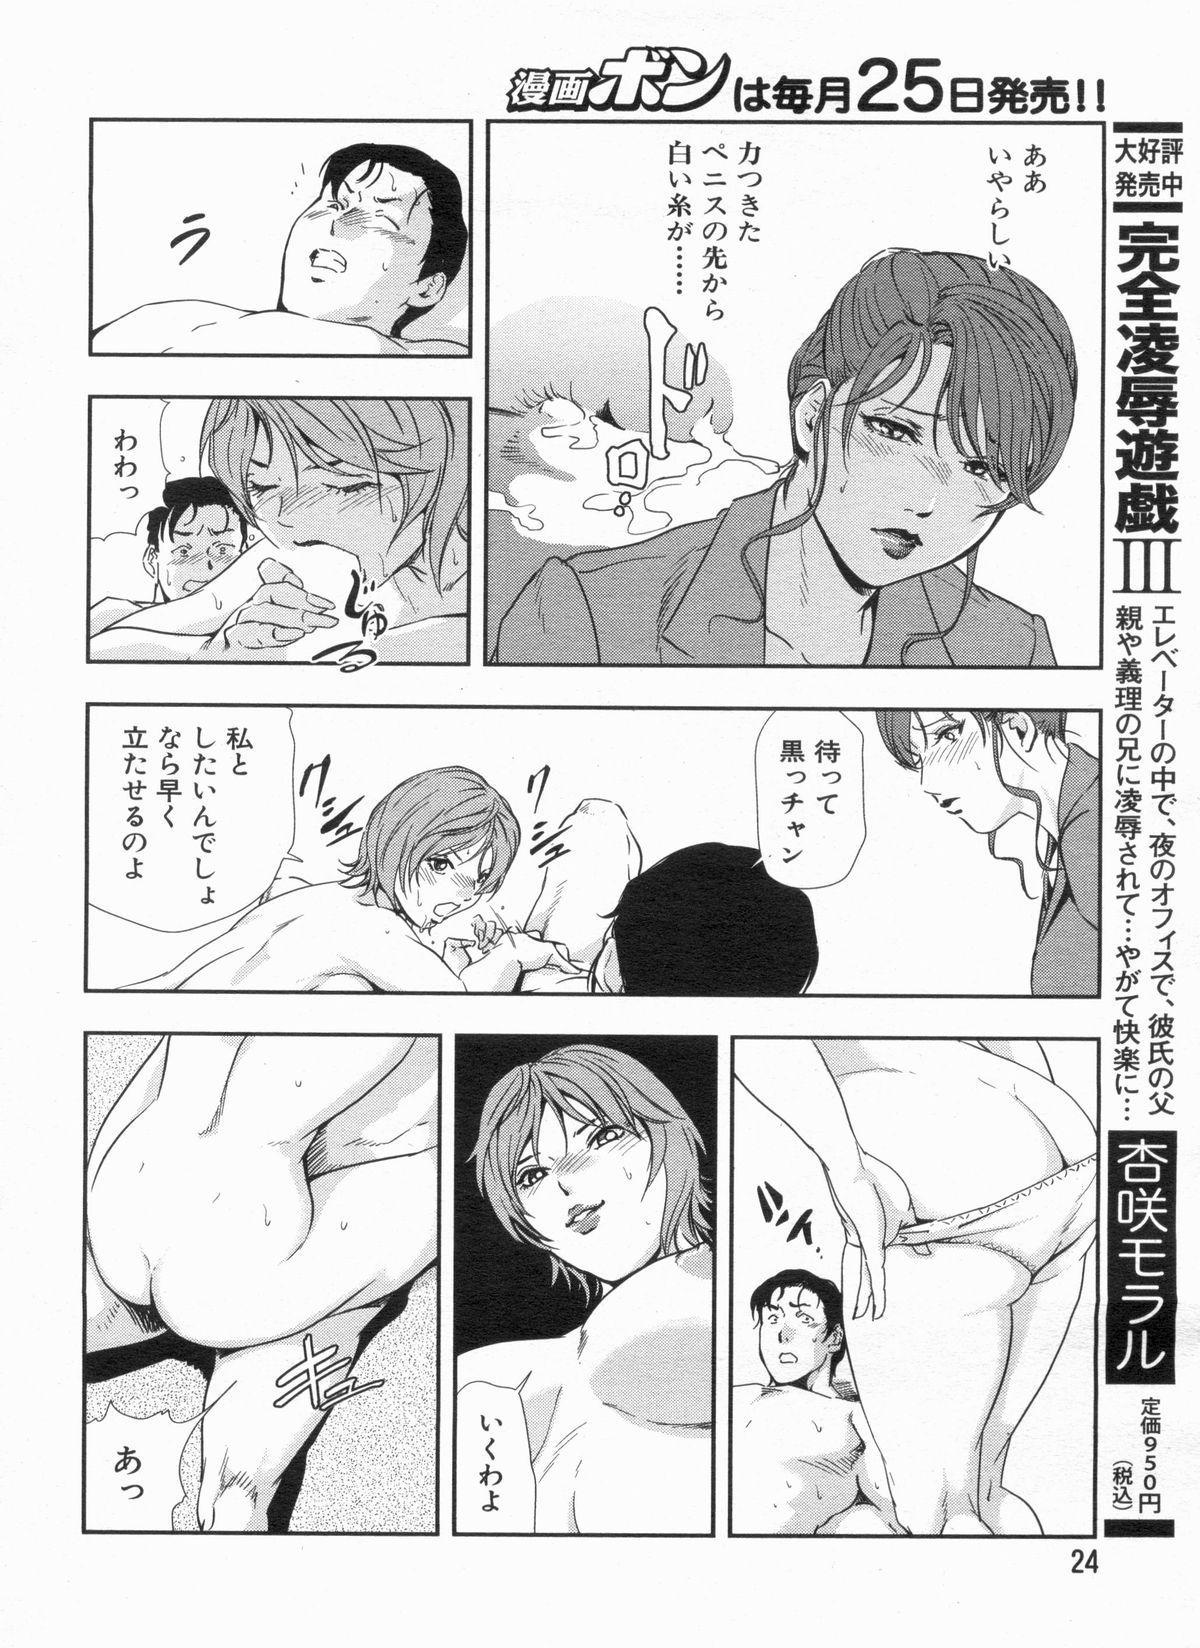 Manga Bon 2013-03 23